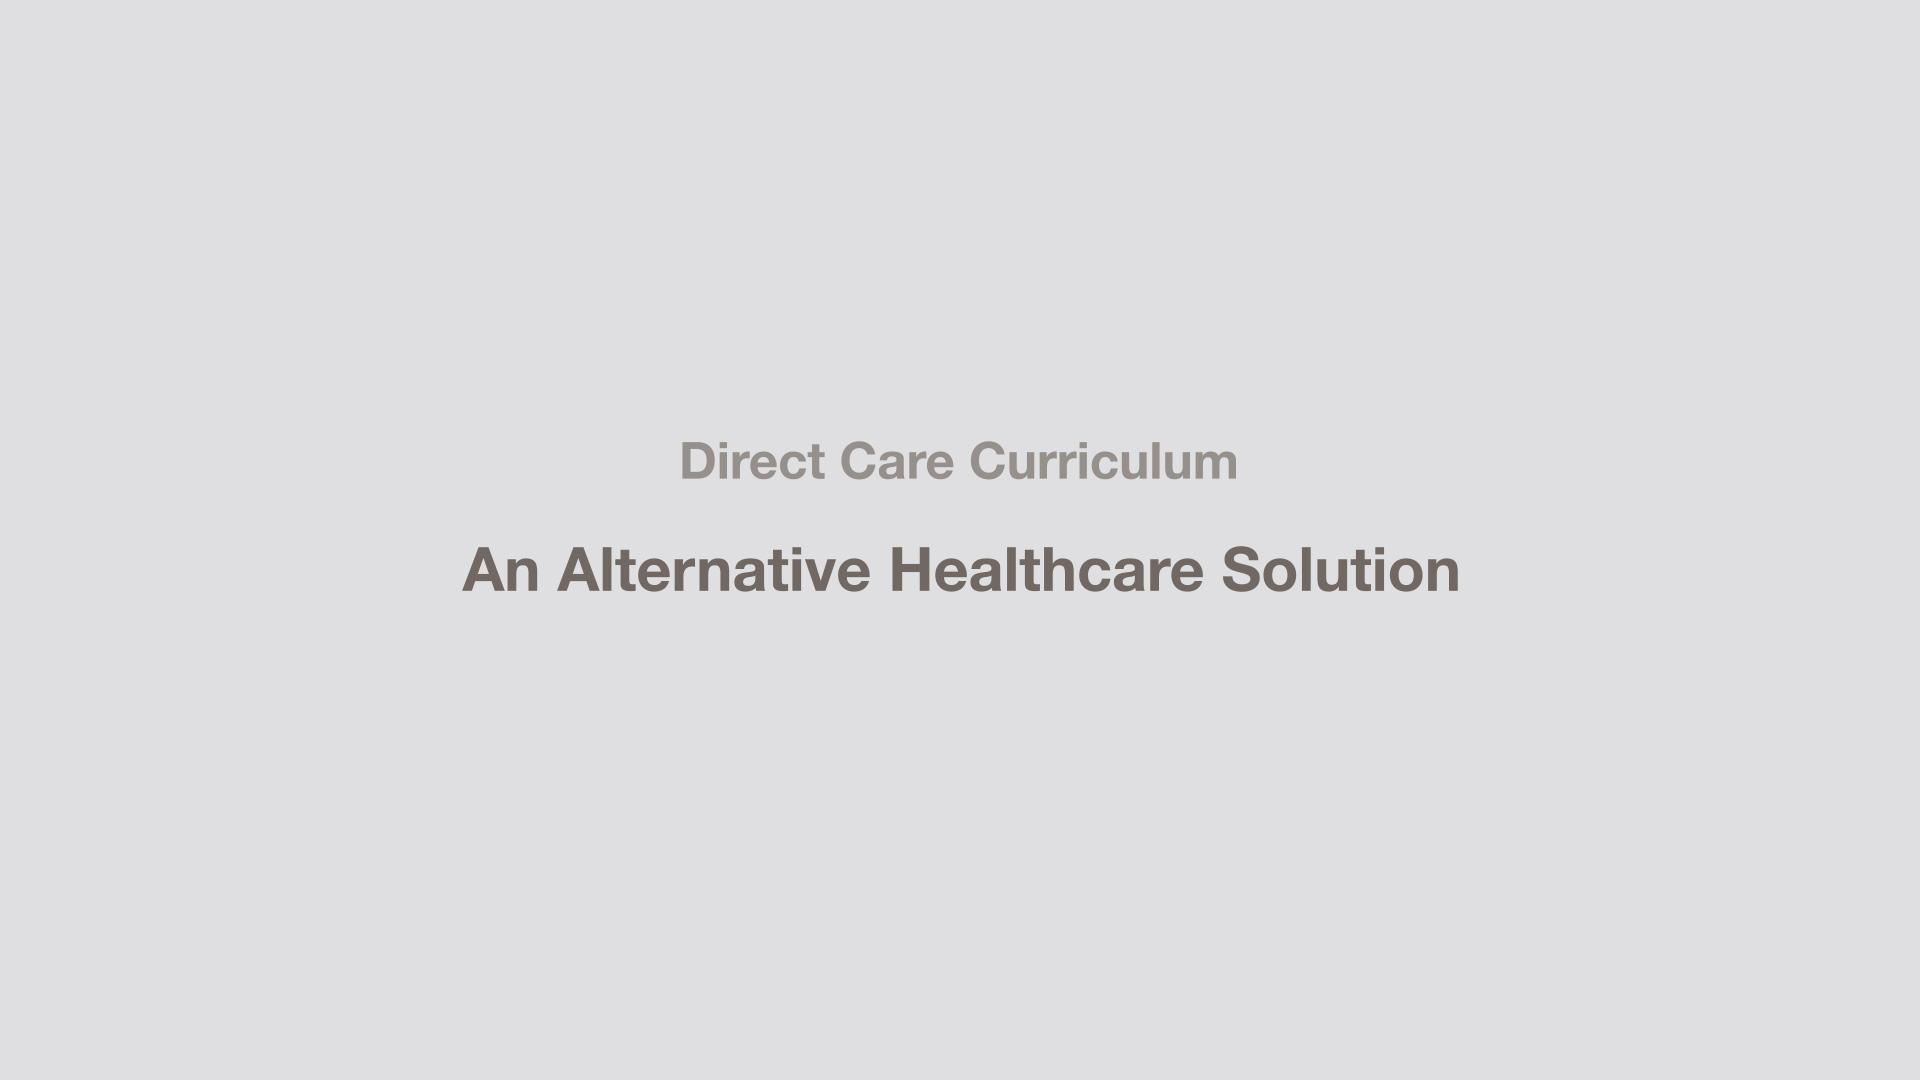 Direct Care: An Alternative Healthcare Solution